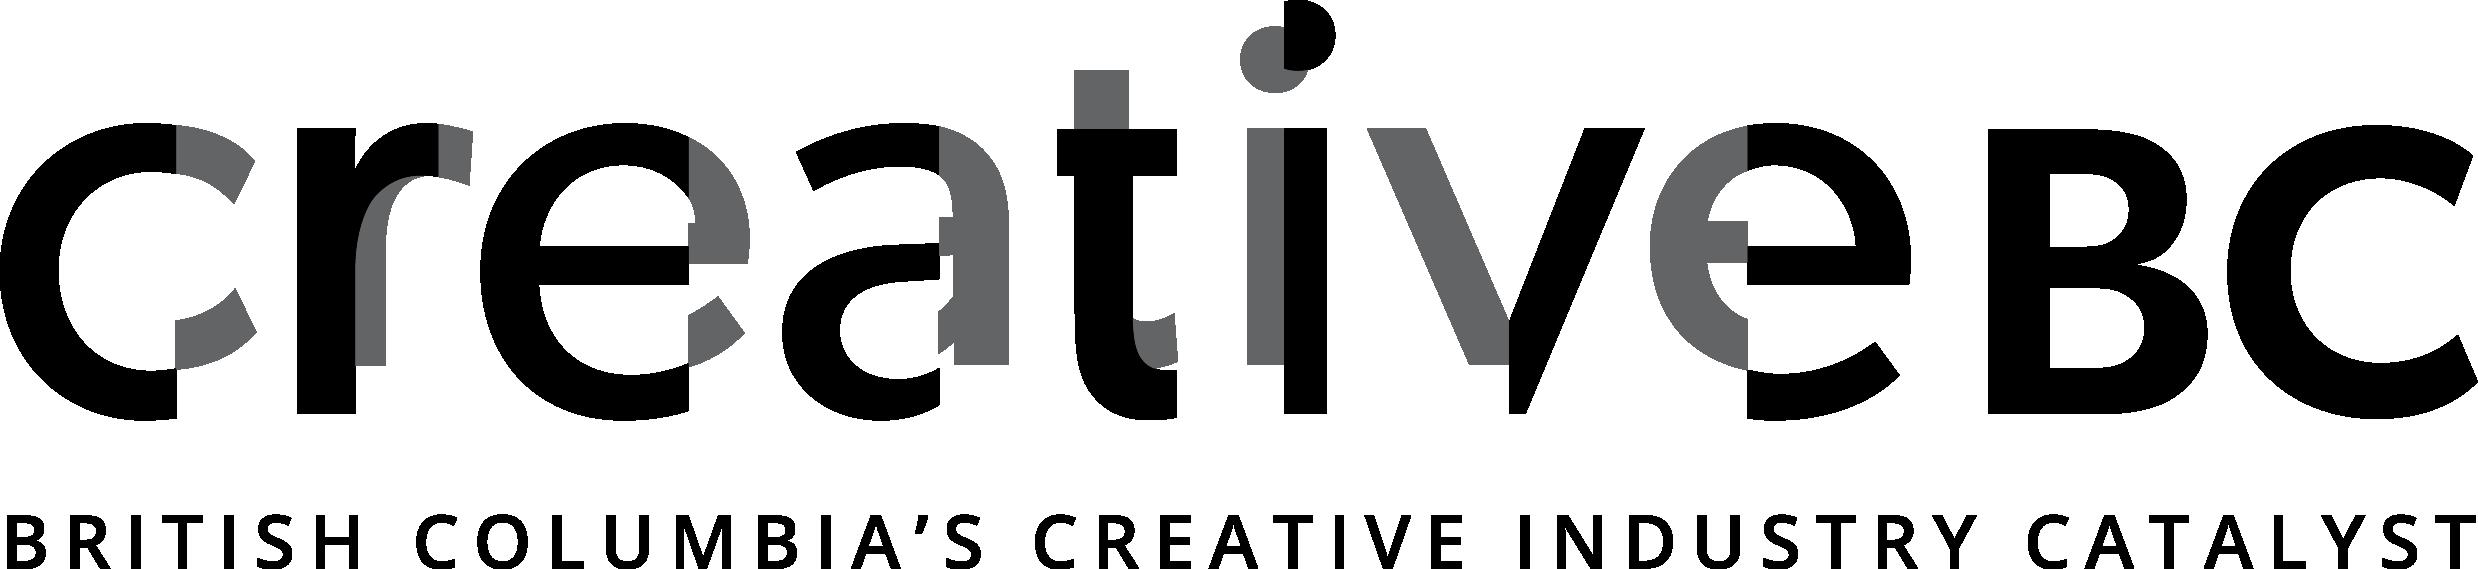 Creative BC Logos & Typography.